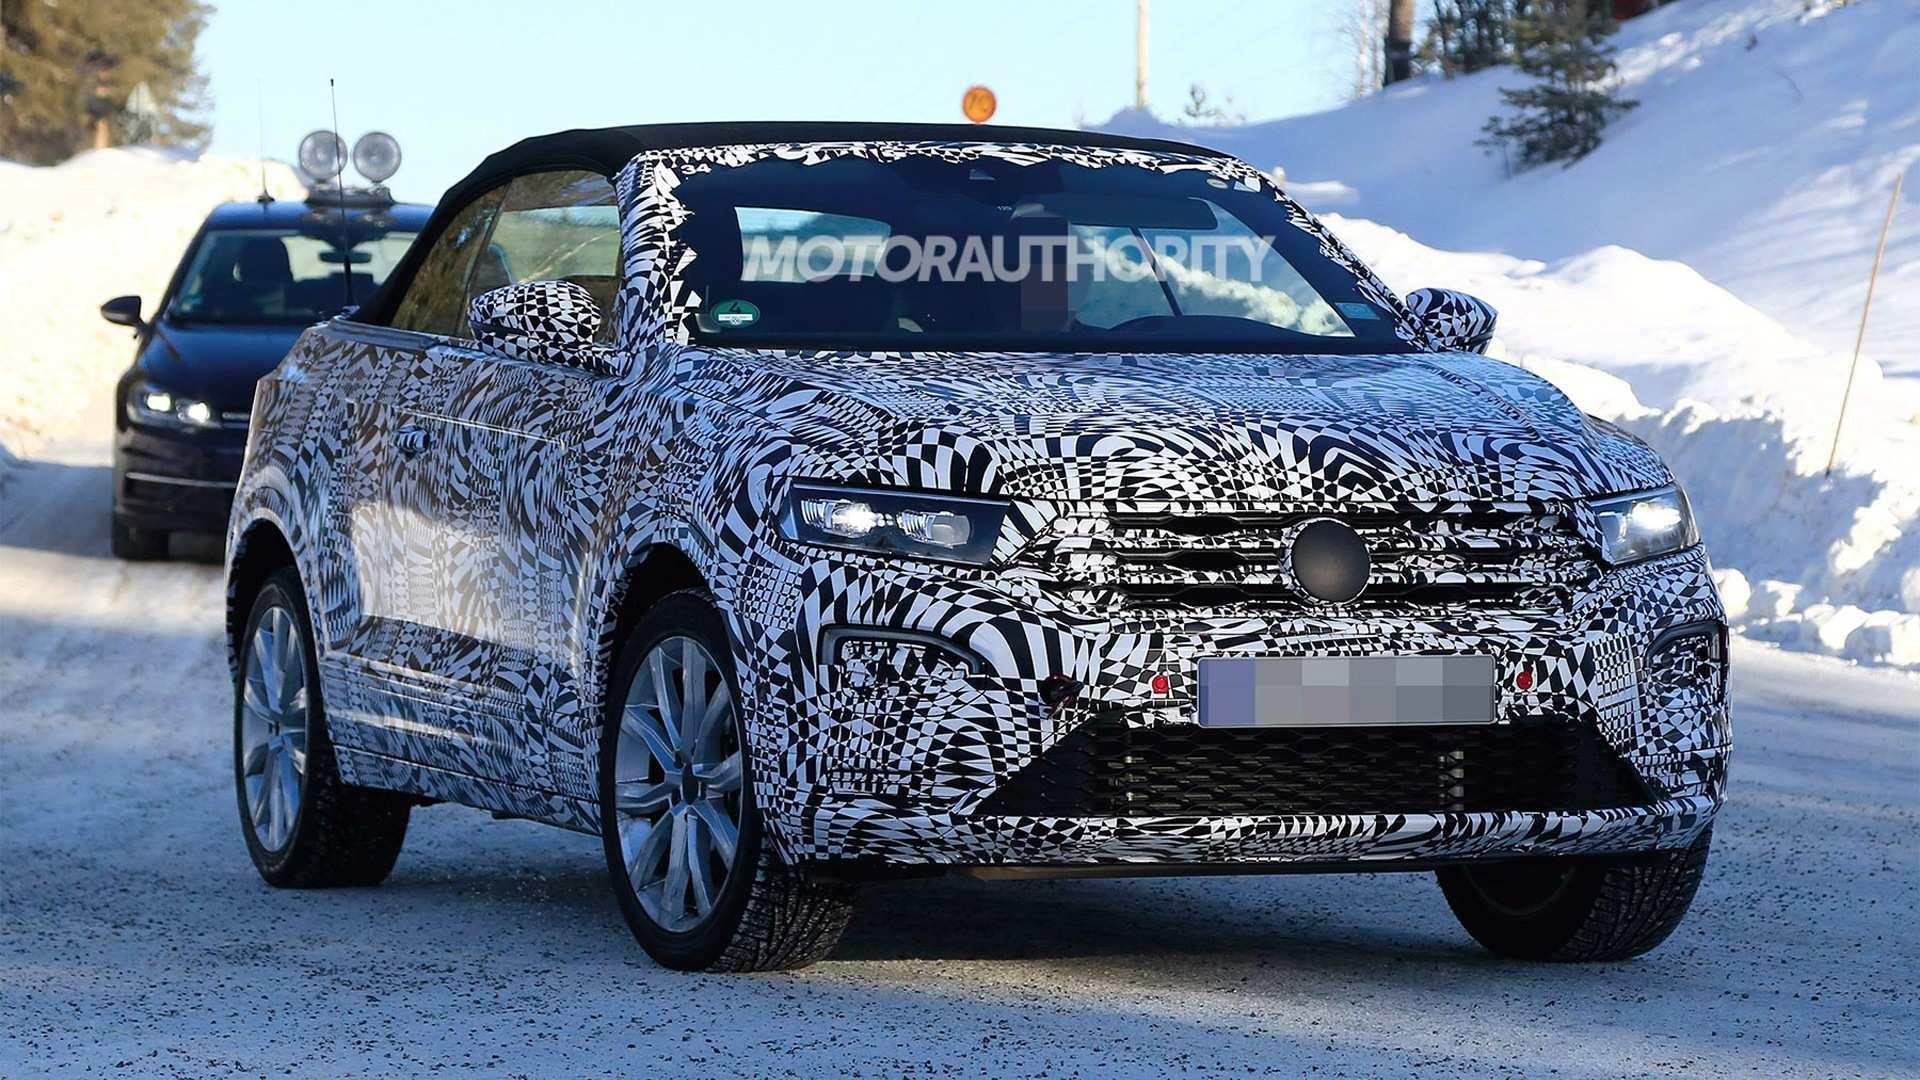 98 Gallery of Volkswagen Convertible 2020 Photos by Volkswagen Convertible 2020